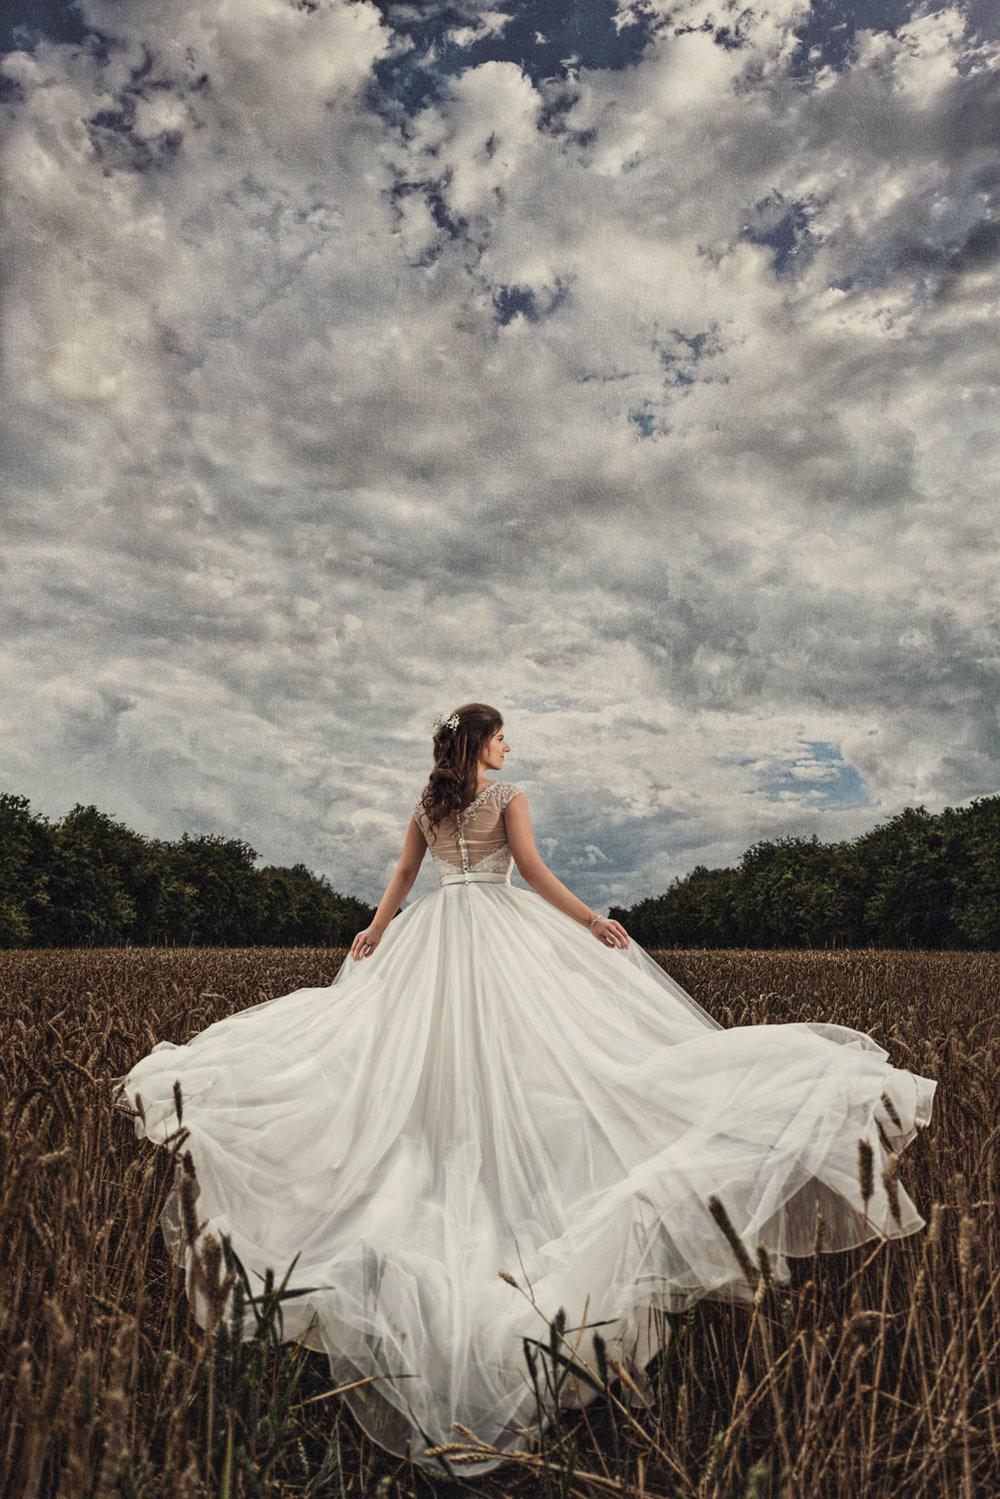 Bride walking through wheat field holding her dress